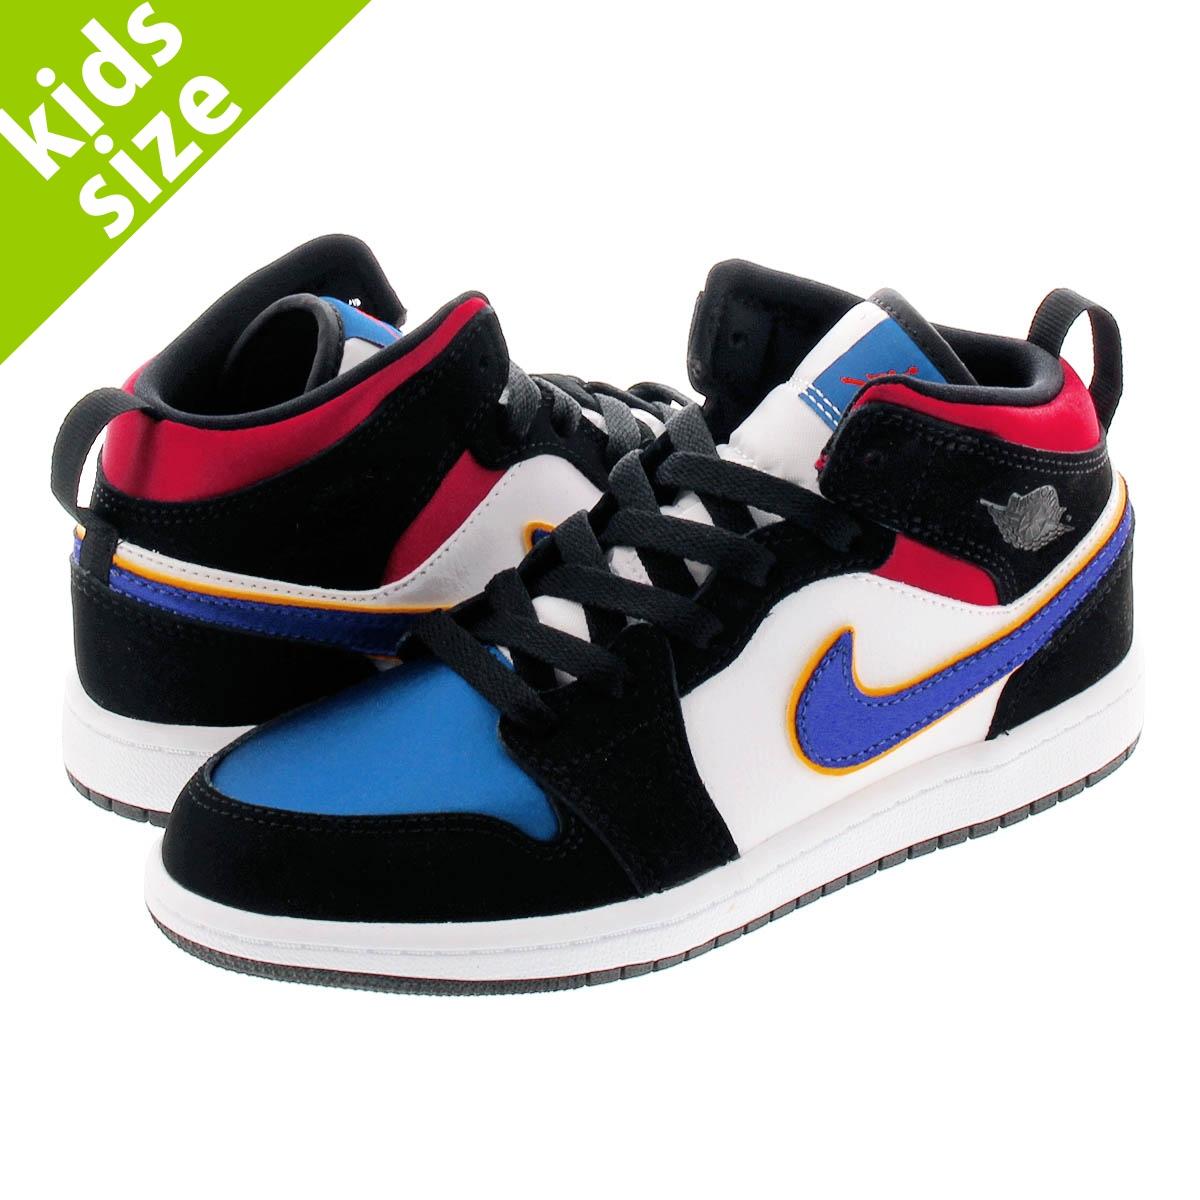 promo code e79c7 37a43 NIKE AIR JORDAN 1 MID SE PS Nike Air Jordan 1 mid SE PS BLACK/FIELD  PURPLE/WHITE/GYM RED bq6932-005